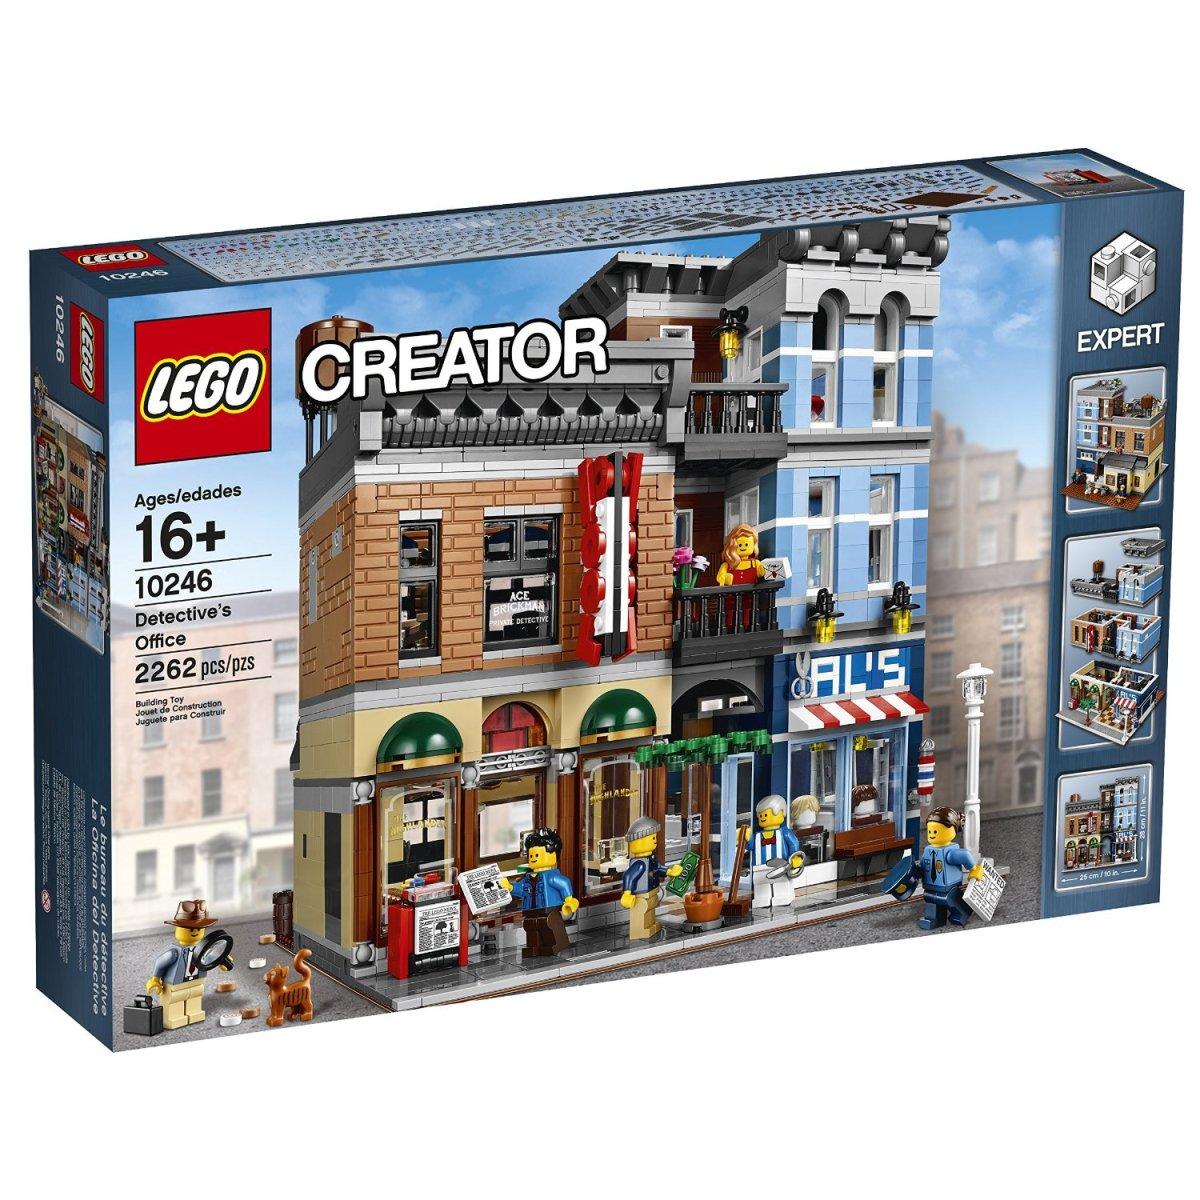 LEGO Creator Detective's Office Modular Building